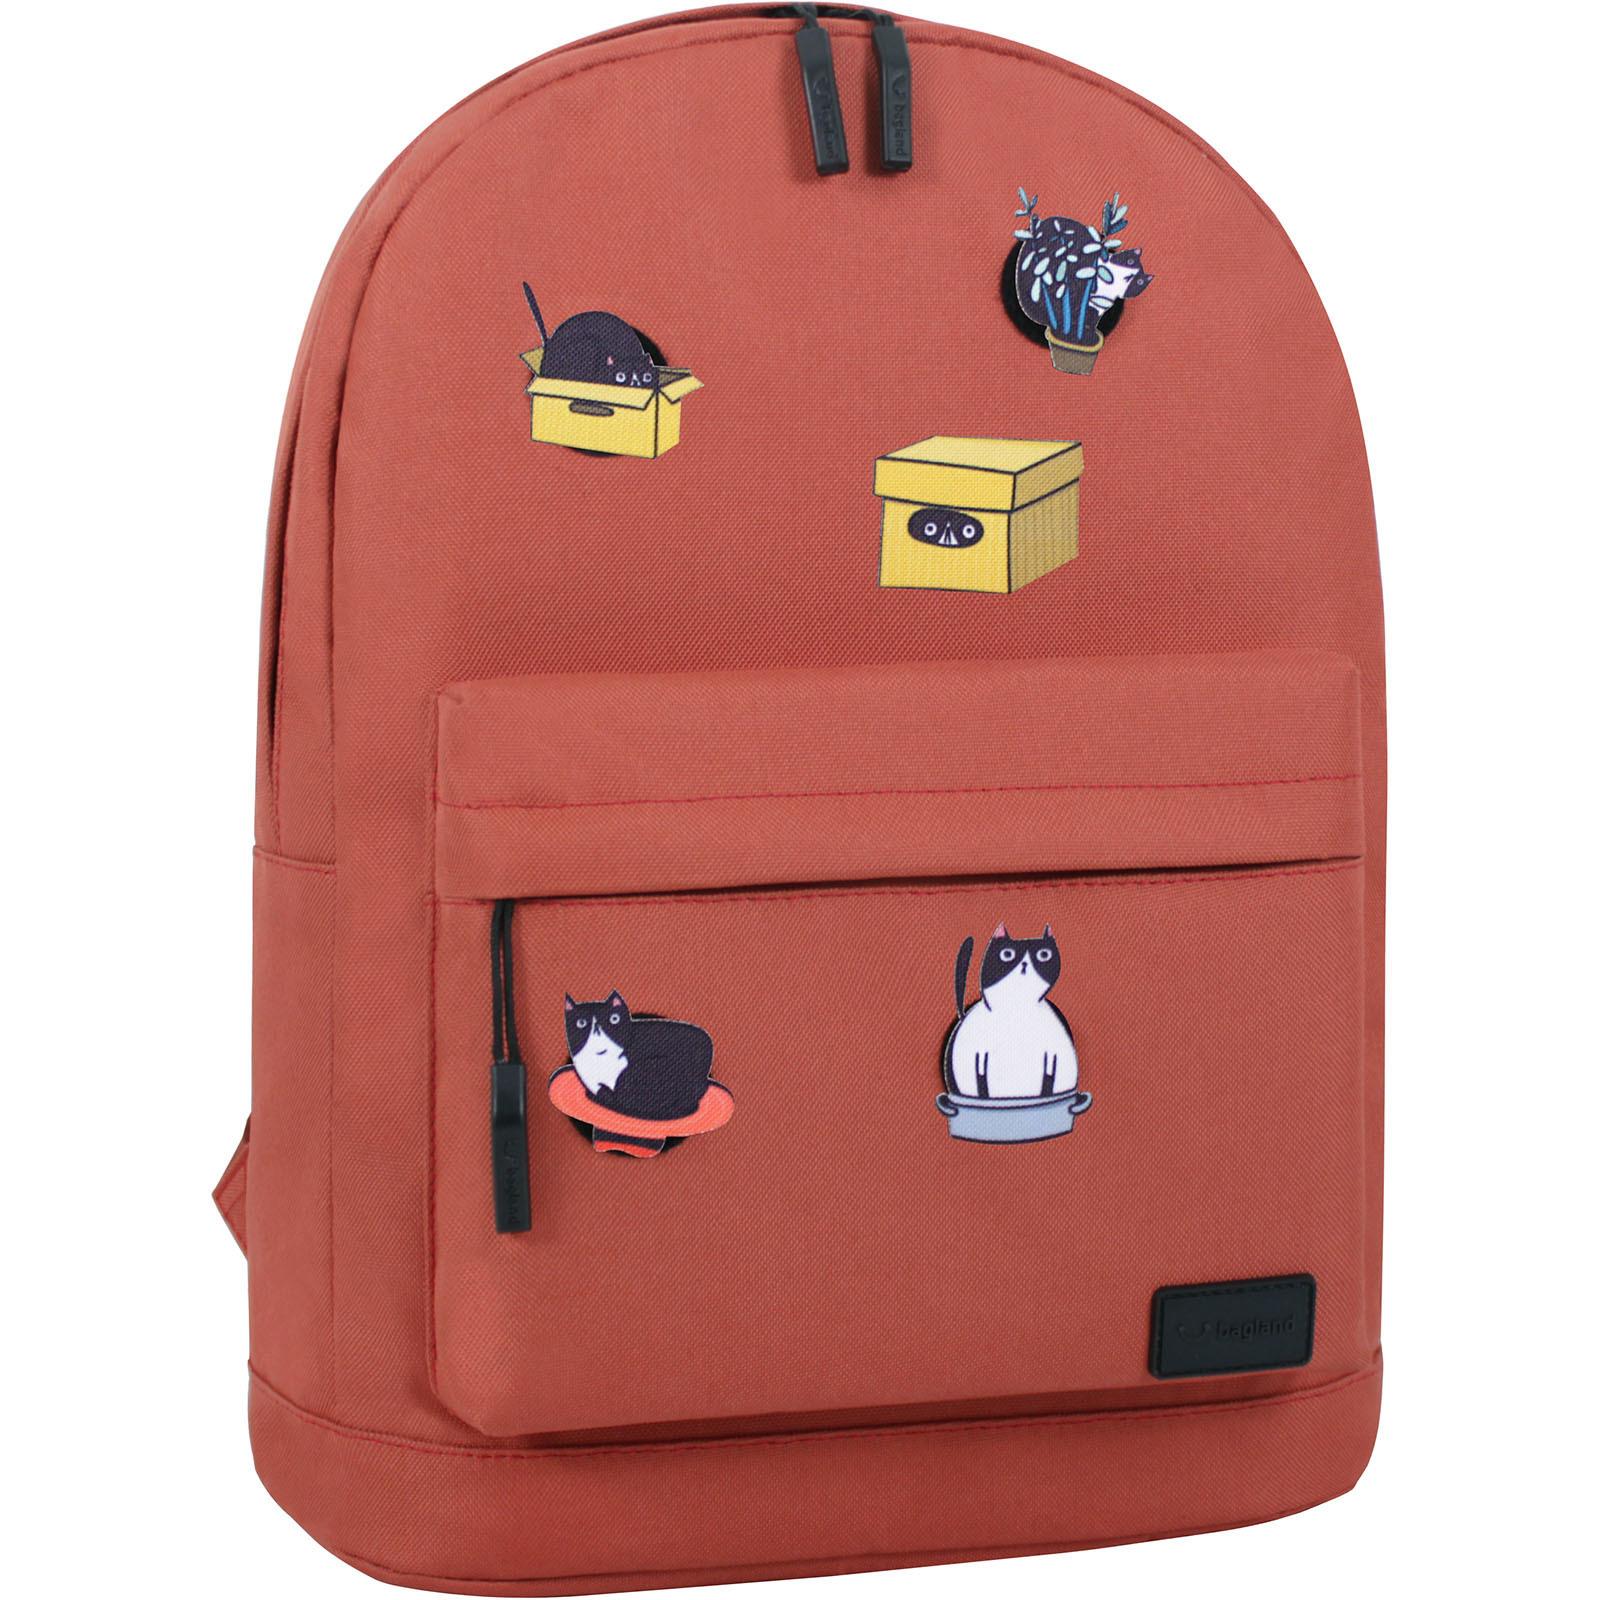 Молодежные рюкзаки Рюкзак Bagland Молодежный W/R 17 л. 286 кирпич (00533662 Ш) IMG_3117.JPG